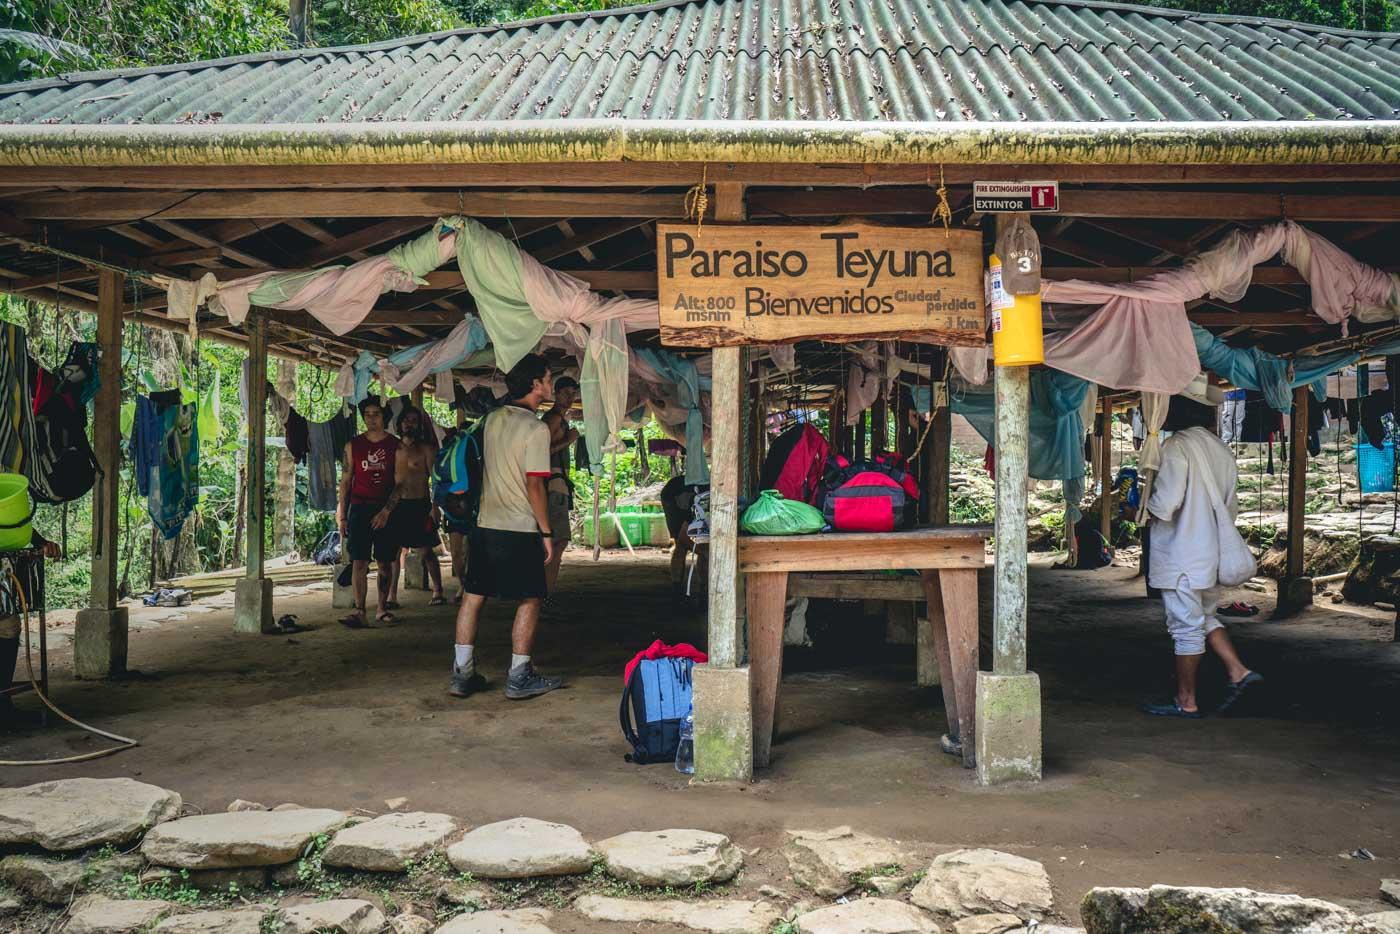 Paraiso Teyuna Camp, Lost City trek